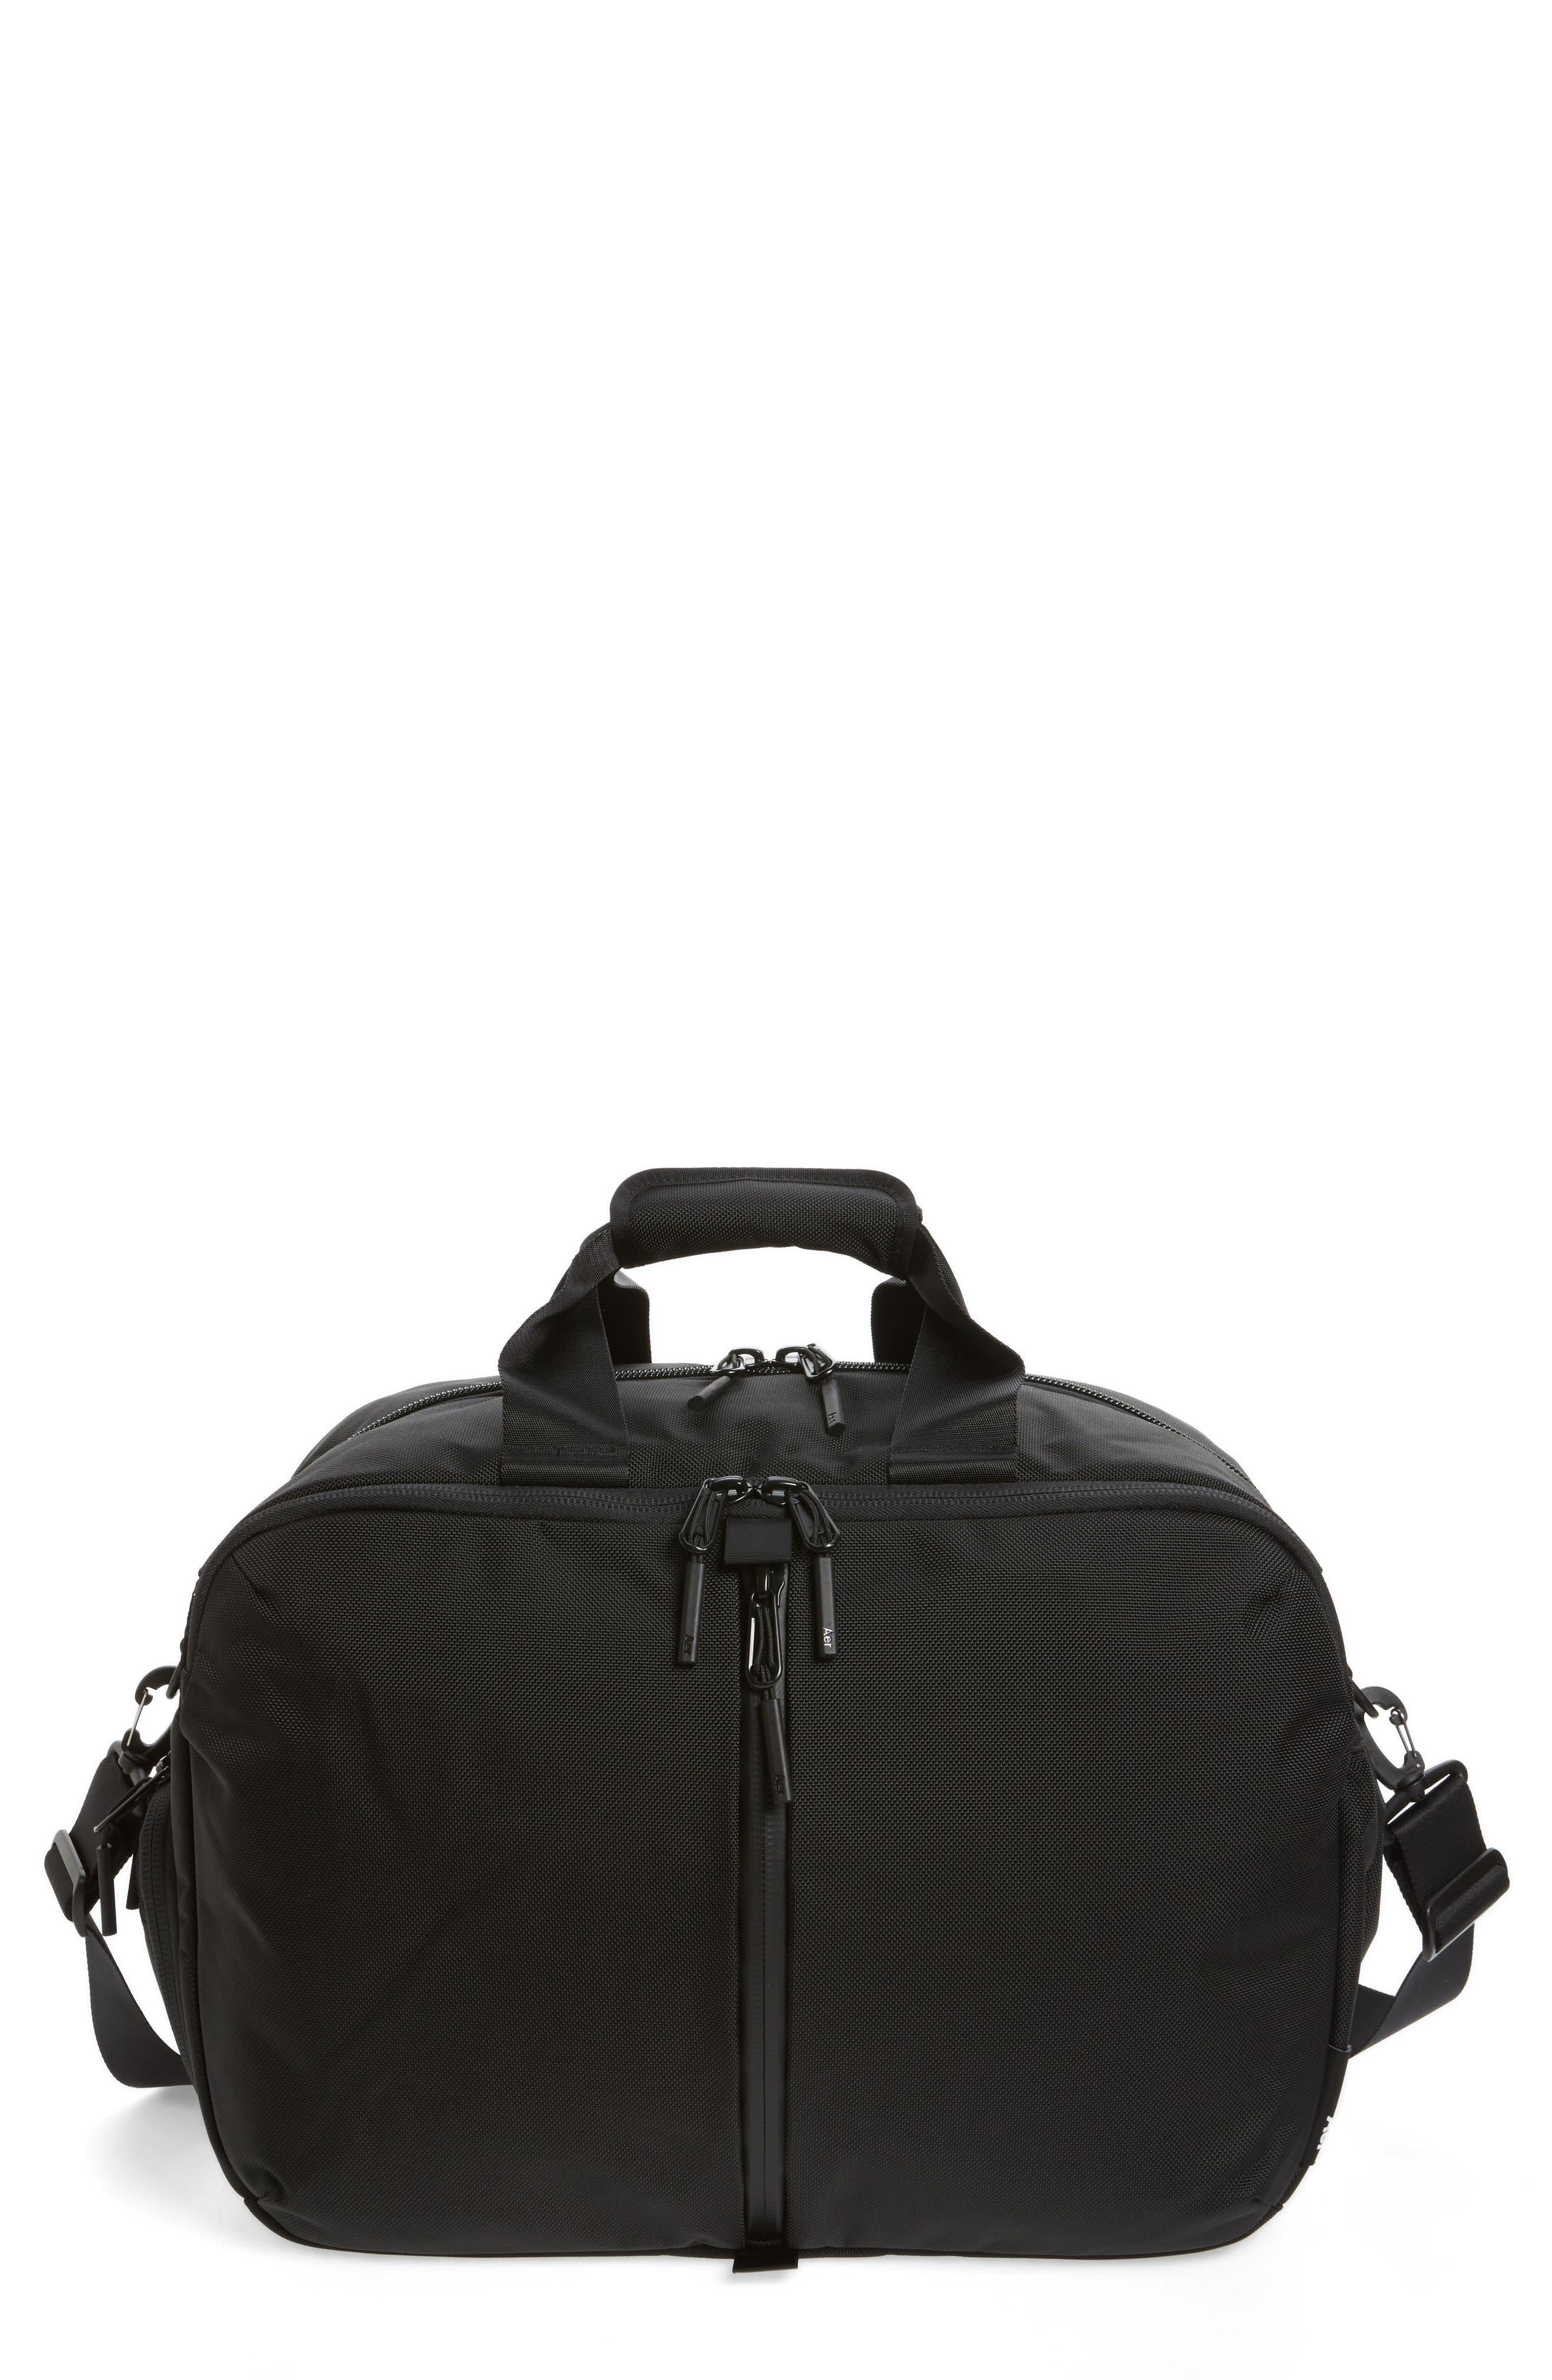 Gym Duffel 2 Bag,                             Main thumbnail 1, color,                             Black